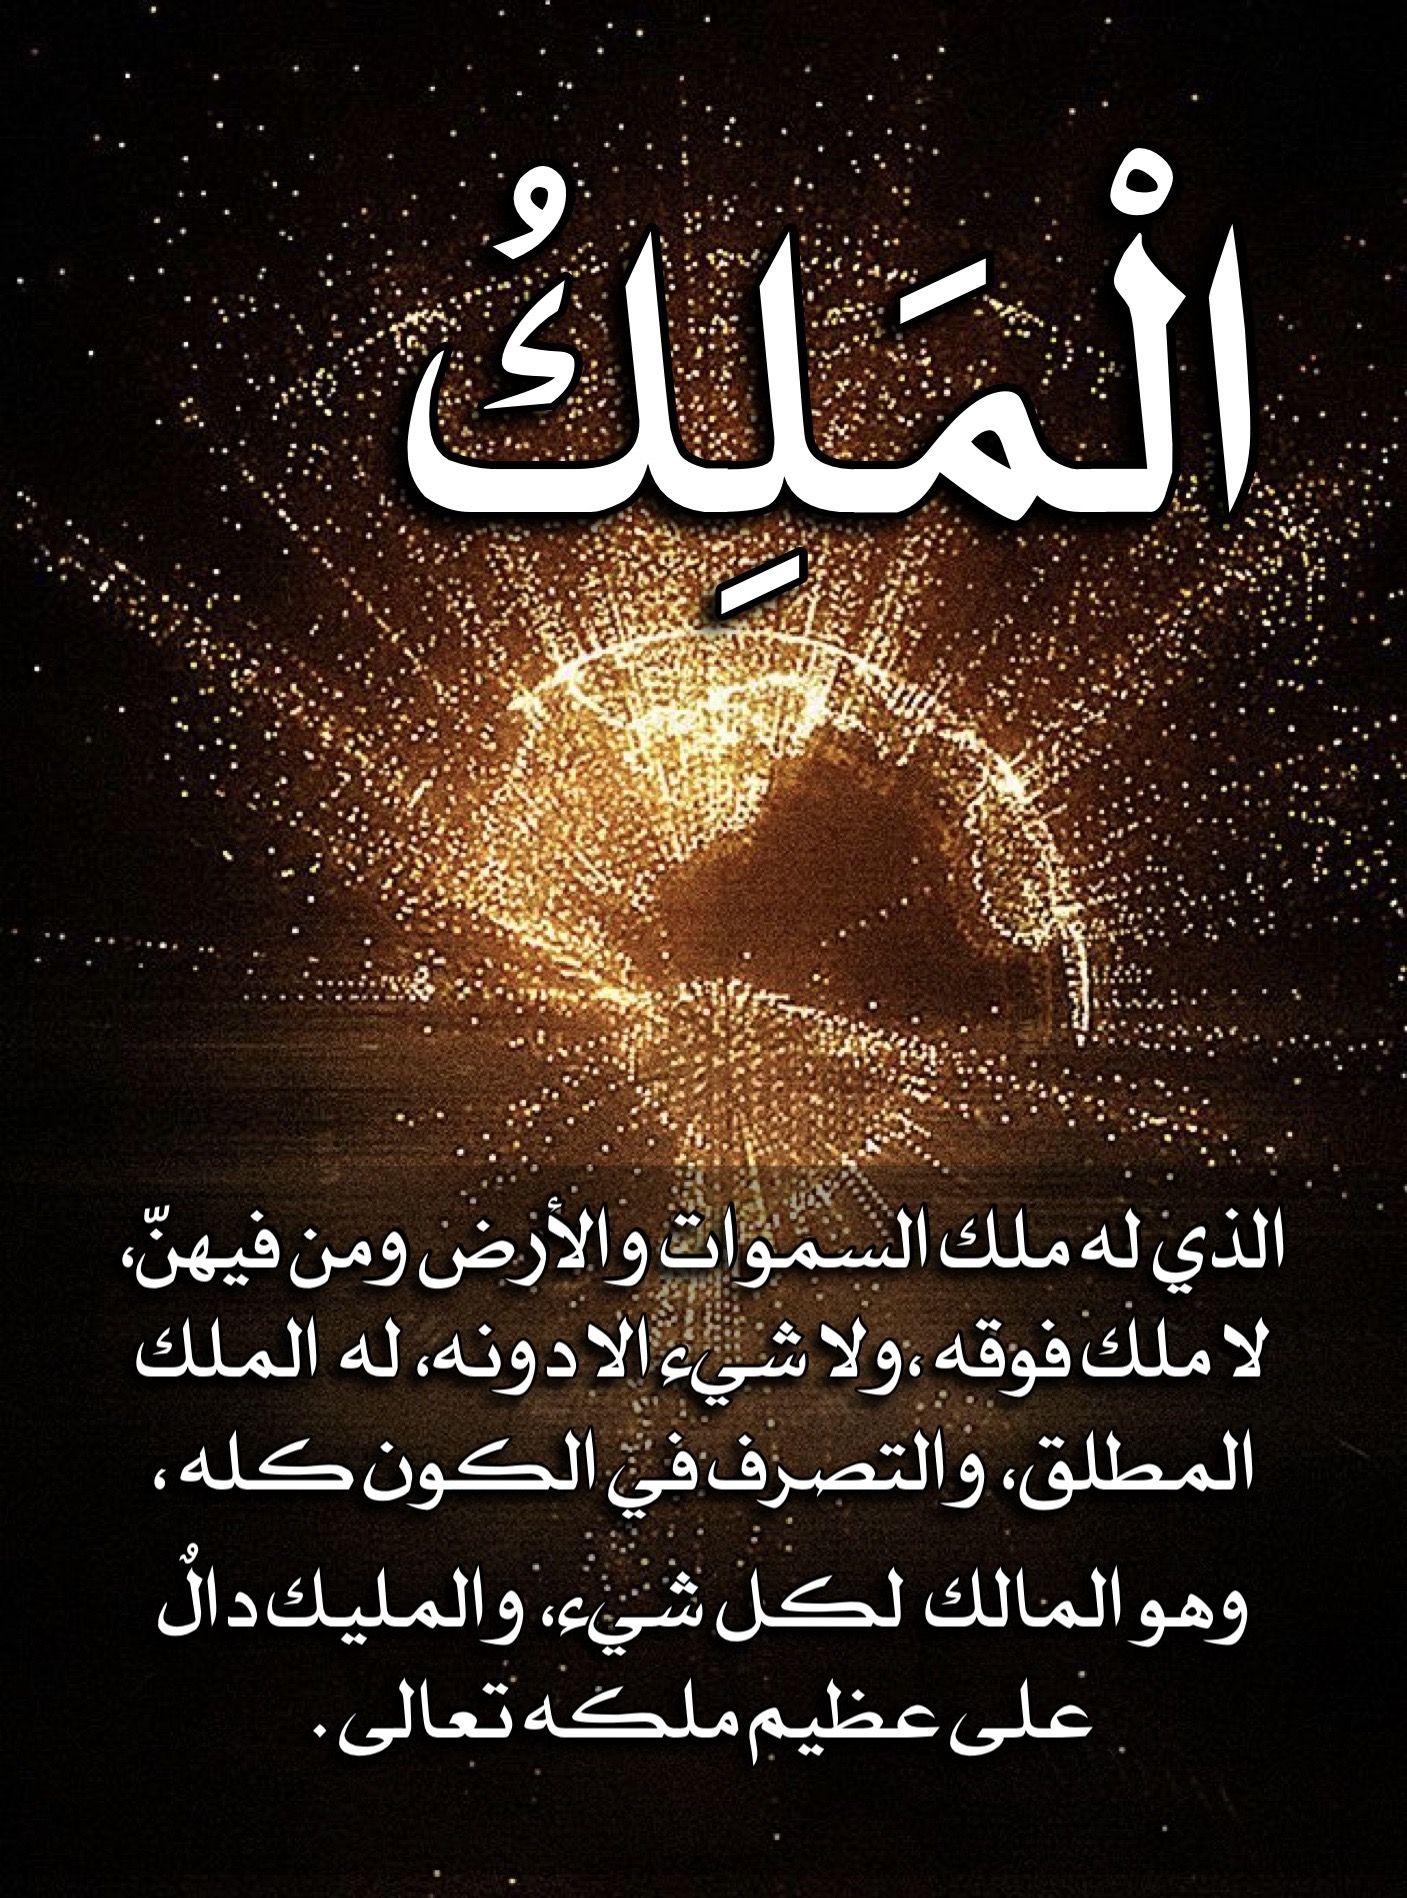 Pin By الأثر الجميل On أسماء الله الحسنى Islamic Quotes Quran Verses Prayer For The Day